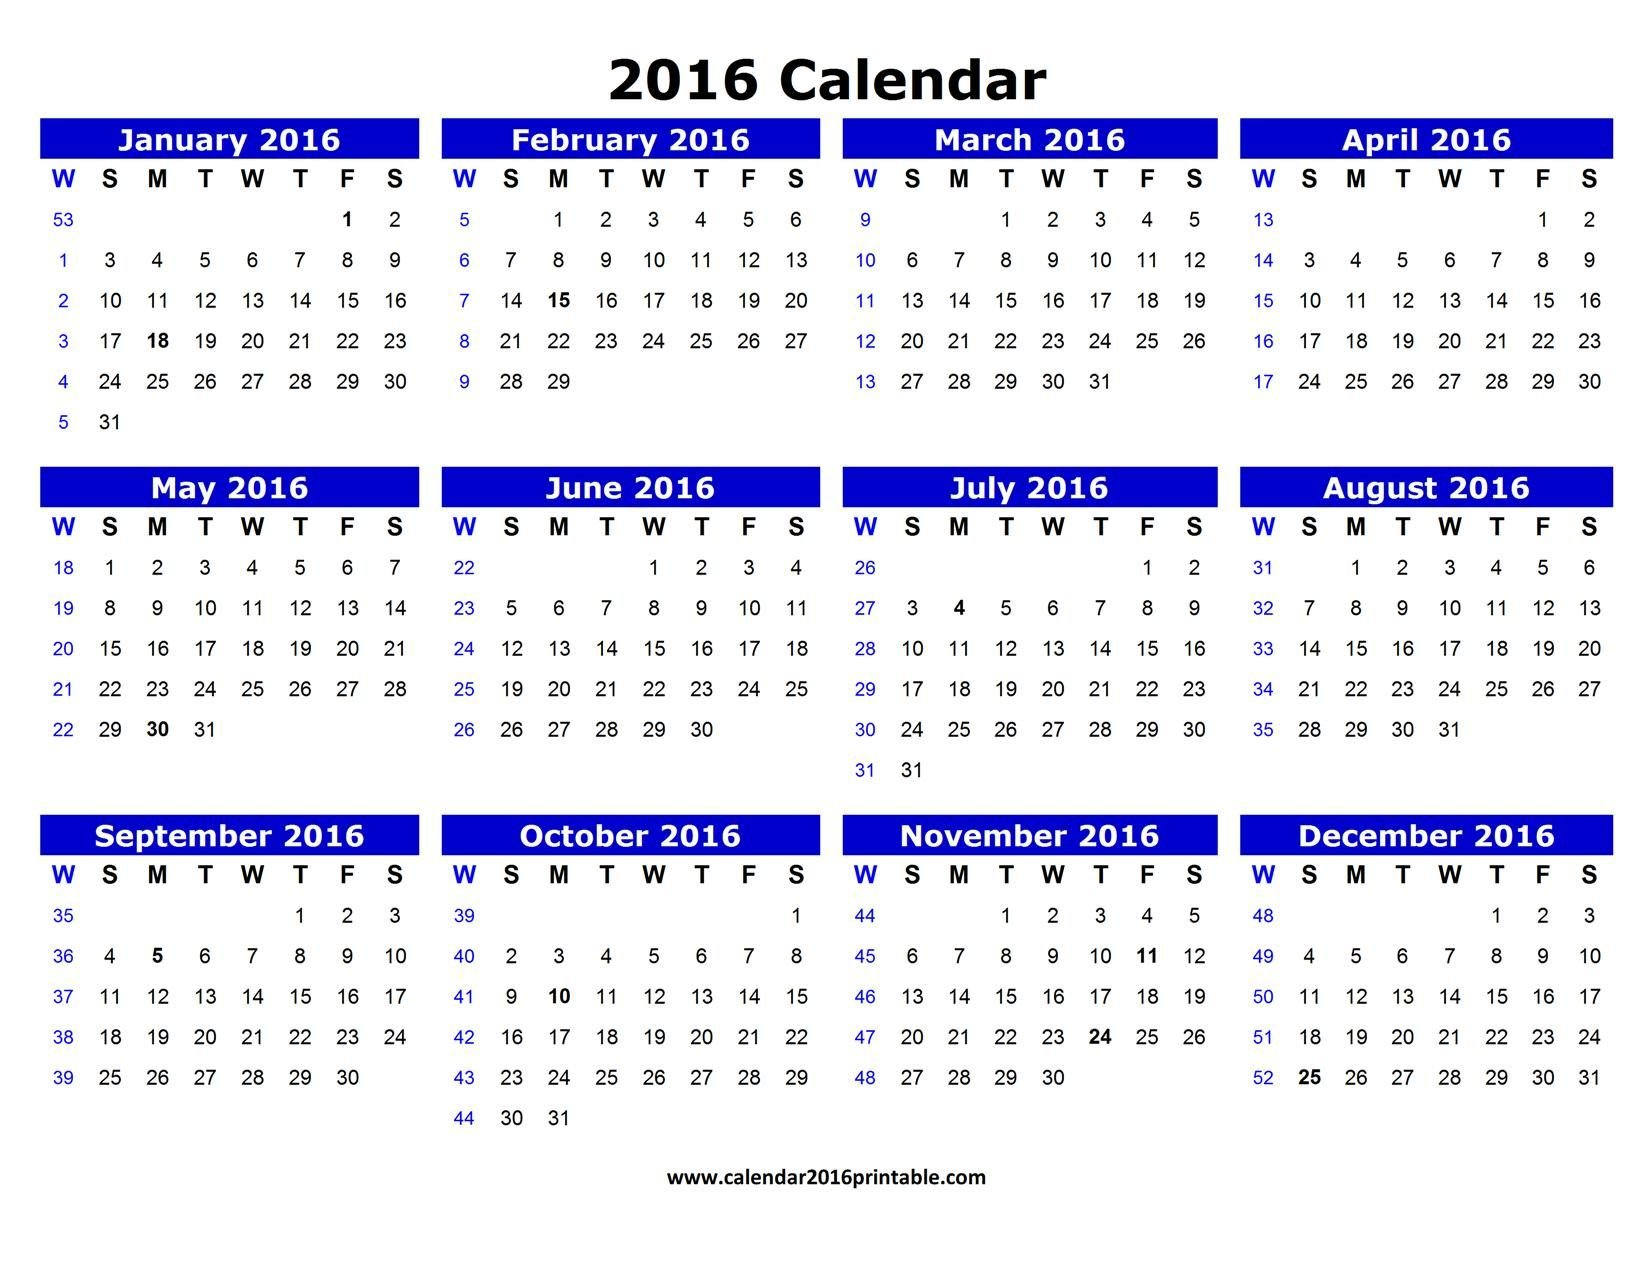 Free 2016 Calendar Pdf That You Can Download, Customize Printable Calendar You Can Edit